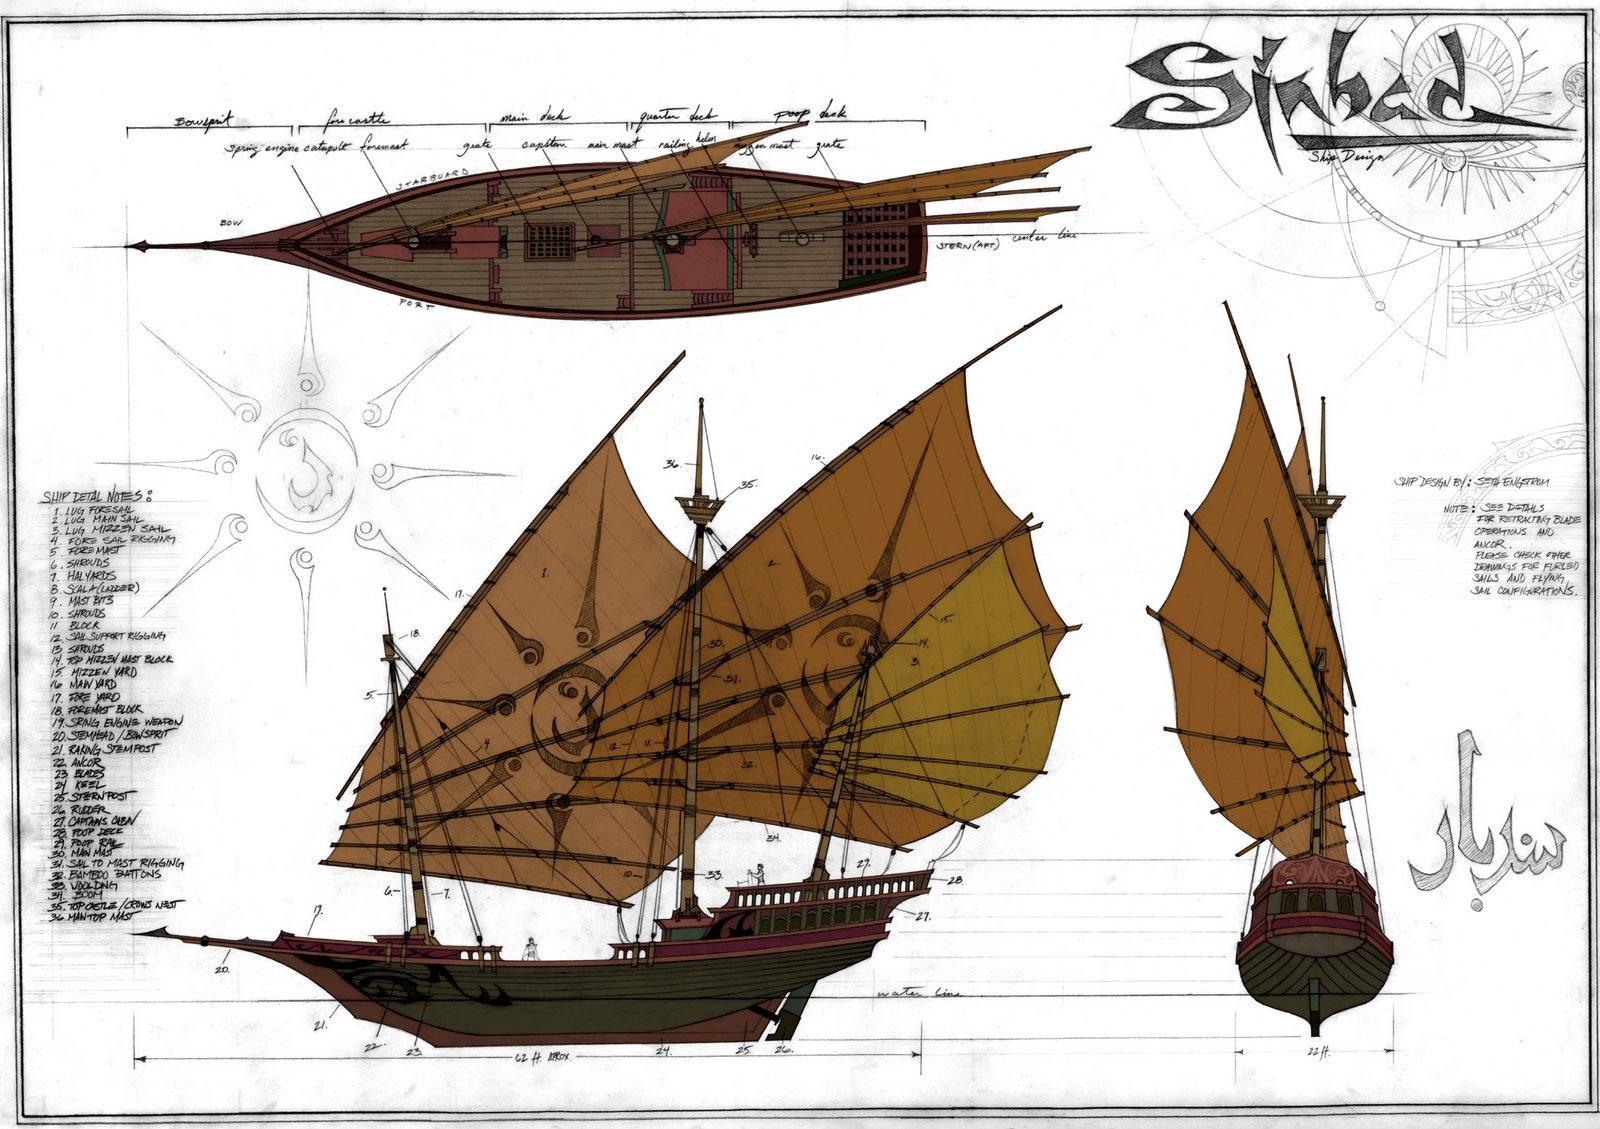 Sexy Bitch Sinbad legend of the seven seas porn